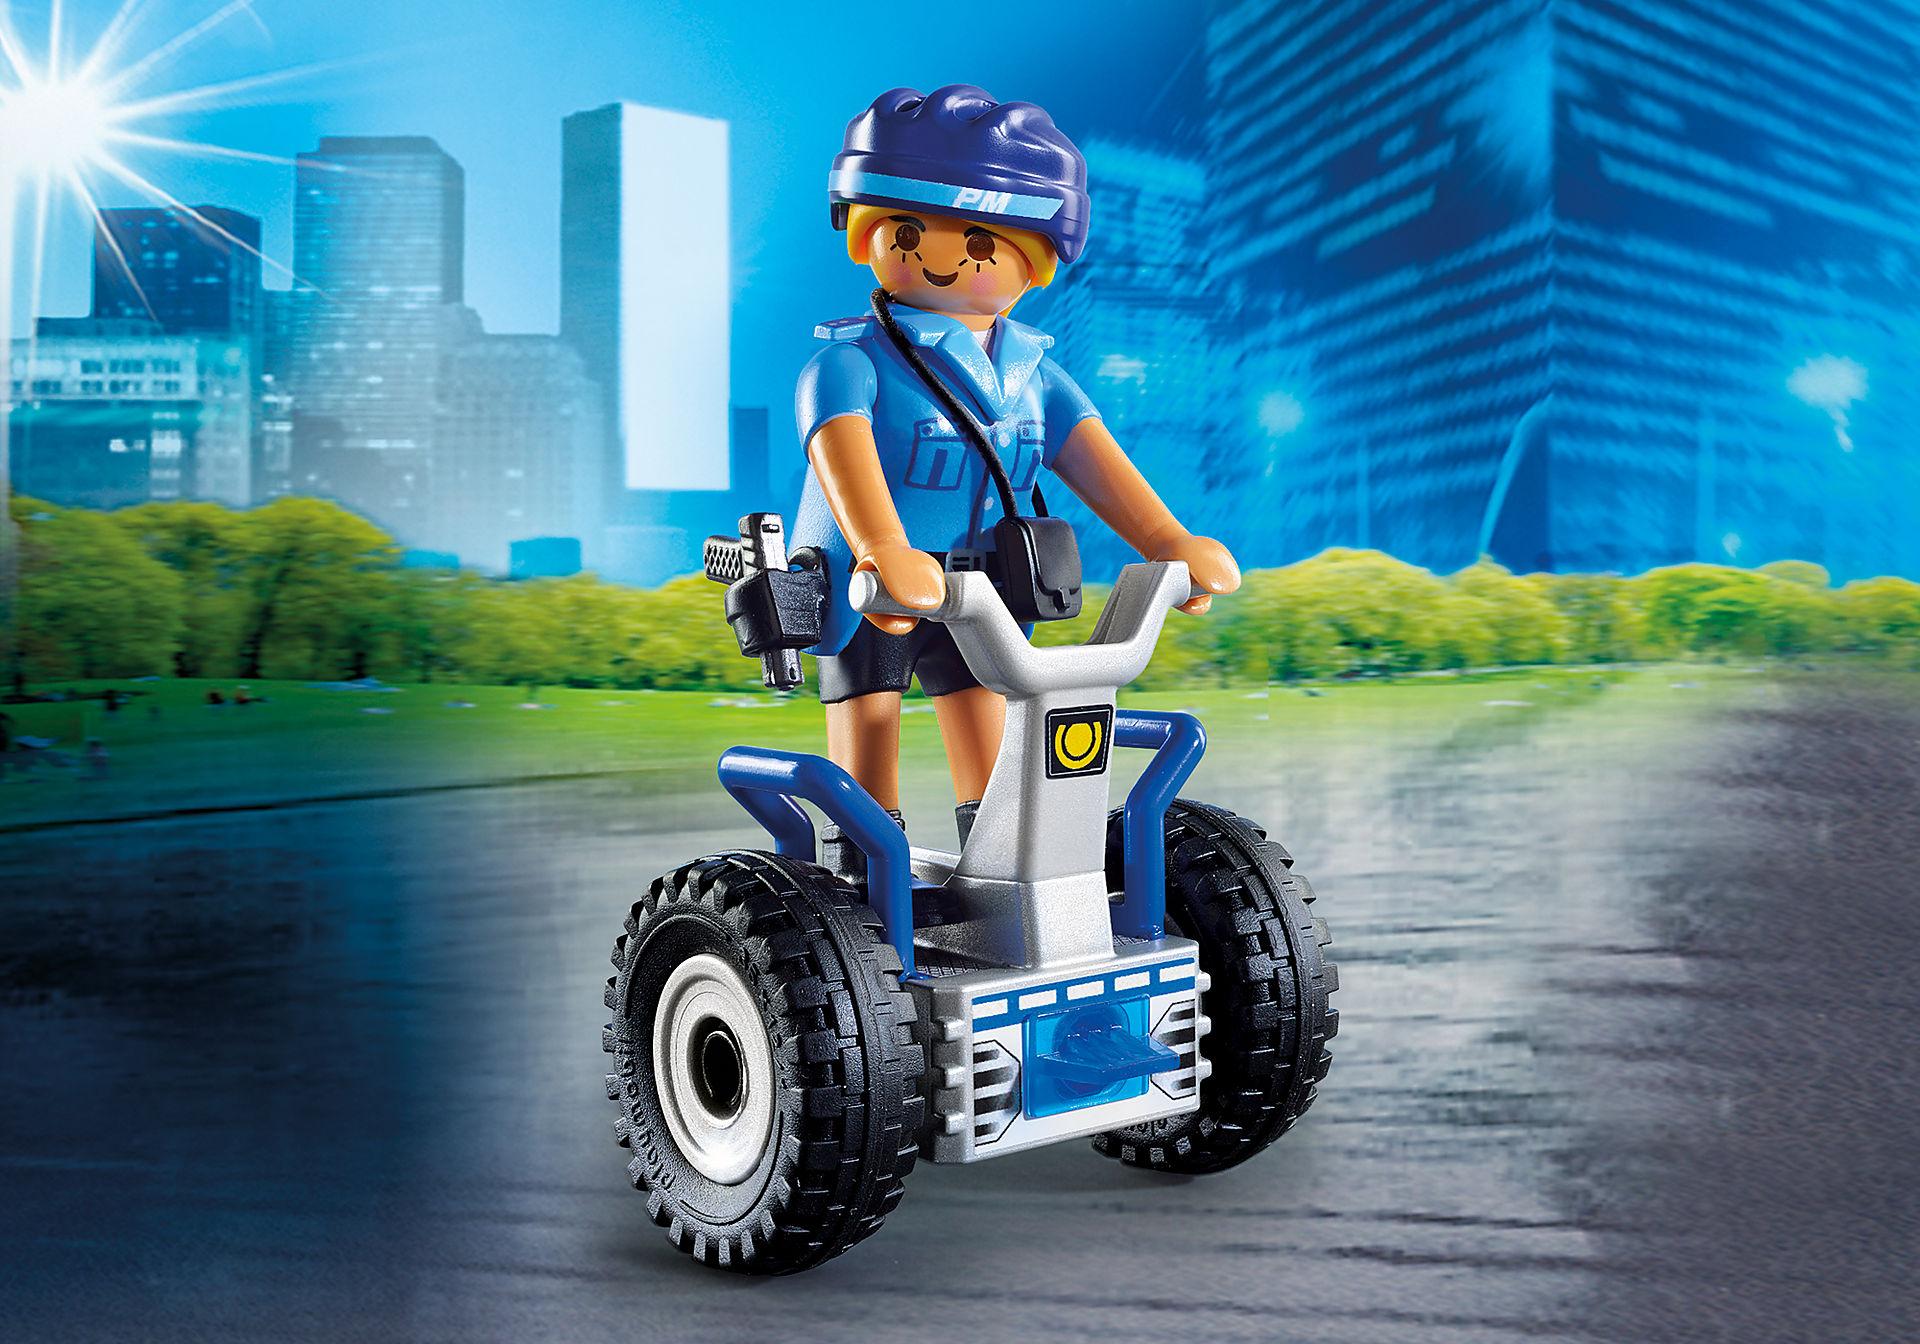 6877 Policía con Balance Racer zoom image1